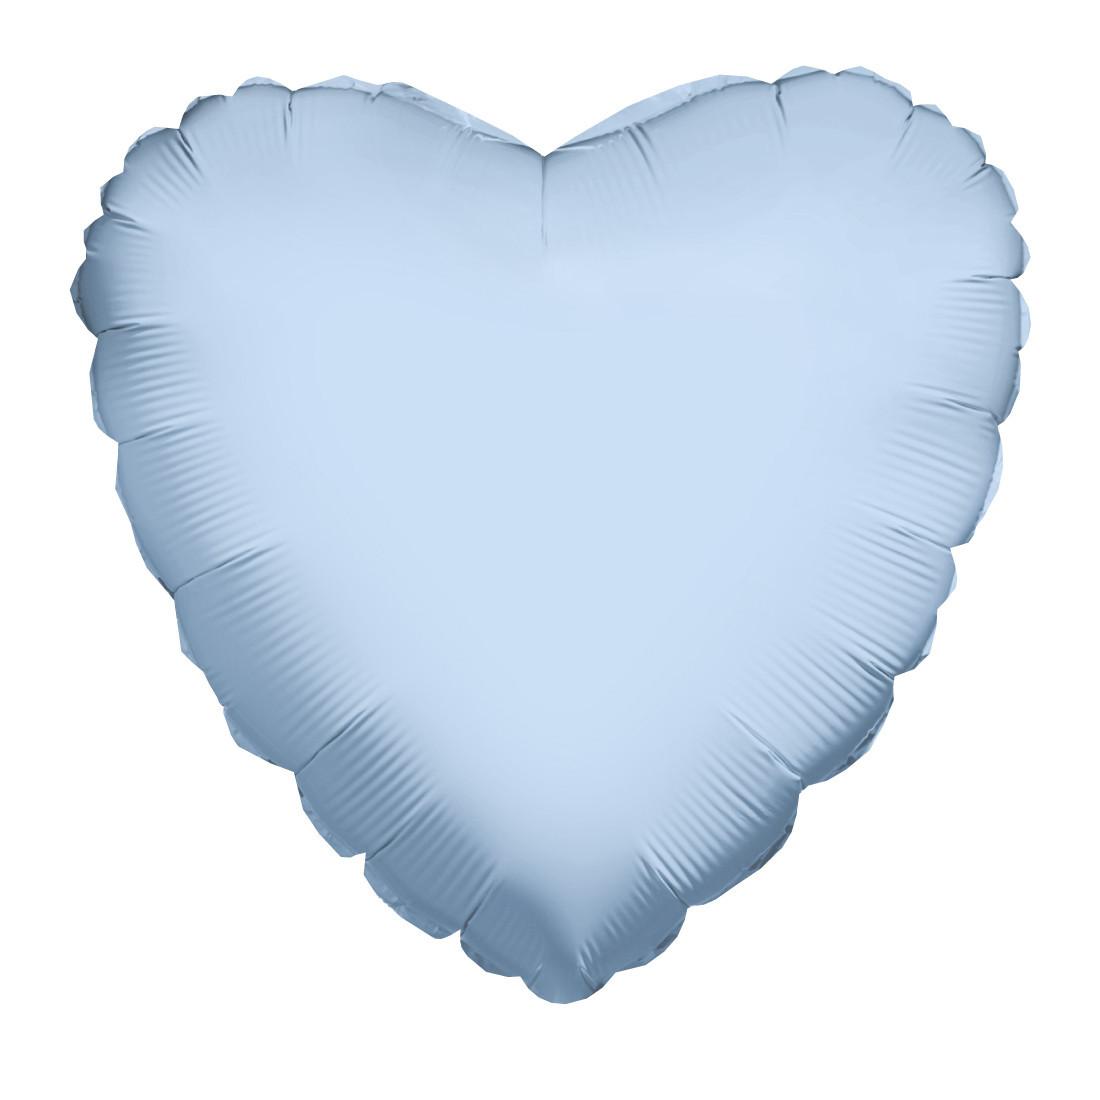 "HERZ HELLBLAU 46 CM / HEART LIGHT BLUE 18"""